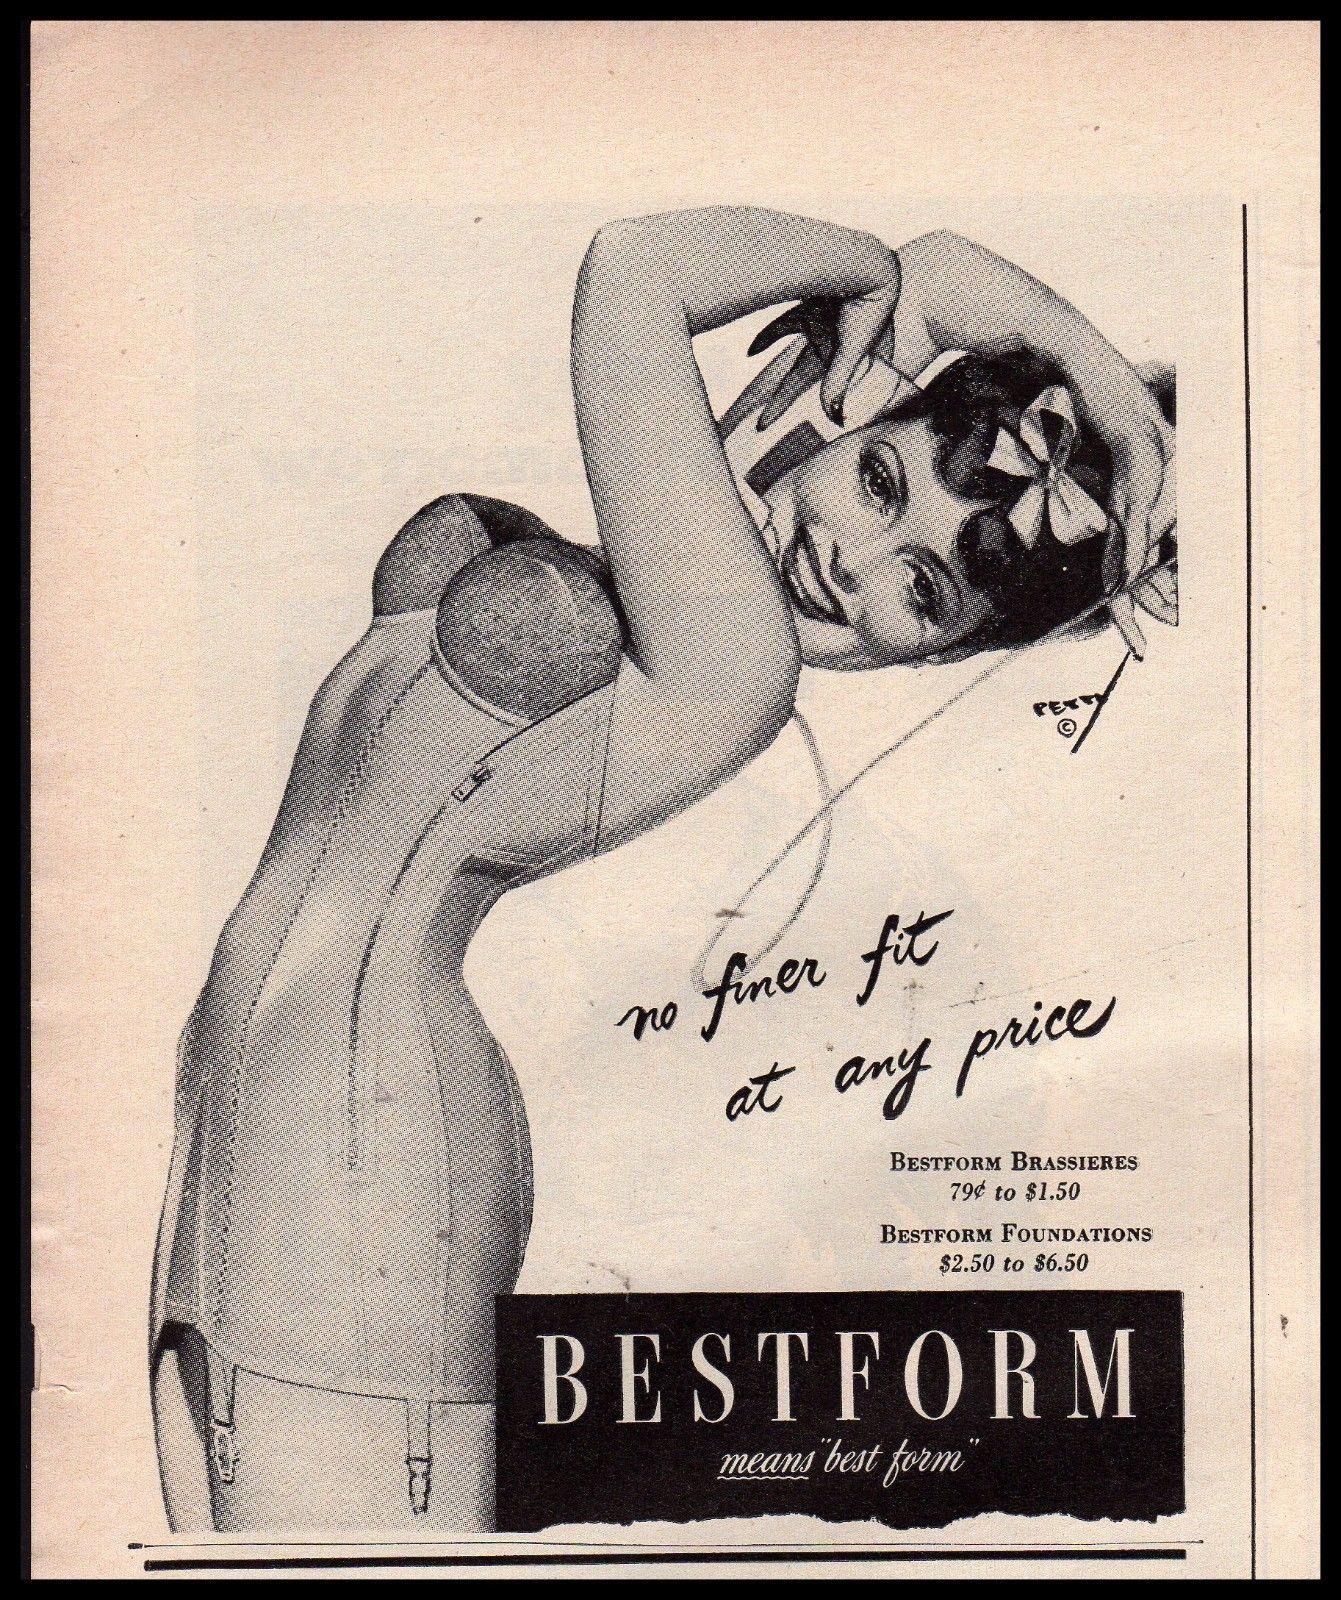 eb4dc79e25618 1944 GEORGE PETTY Pin Up Art Original Bestform Bra Corset Vintage Lingerie  AD | eBay